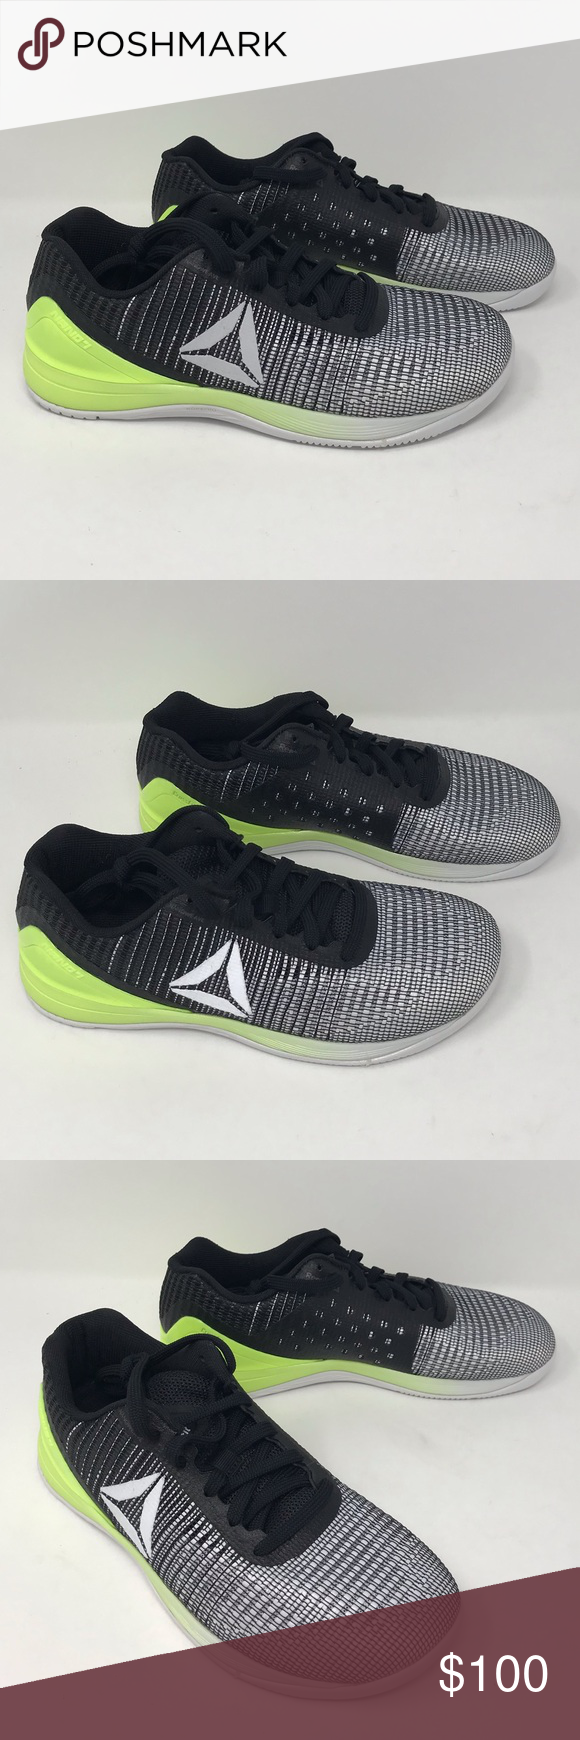 8c0ba838194 Reebok Crossfit Nano 7 Training Shoes - Women Reebok Crossfit Nano 7  Training Shoe - Women s Size  8.5 Color  Black   White   Electric Flash  Condition  New ...